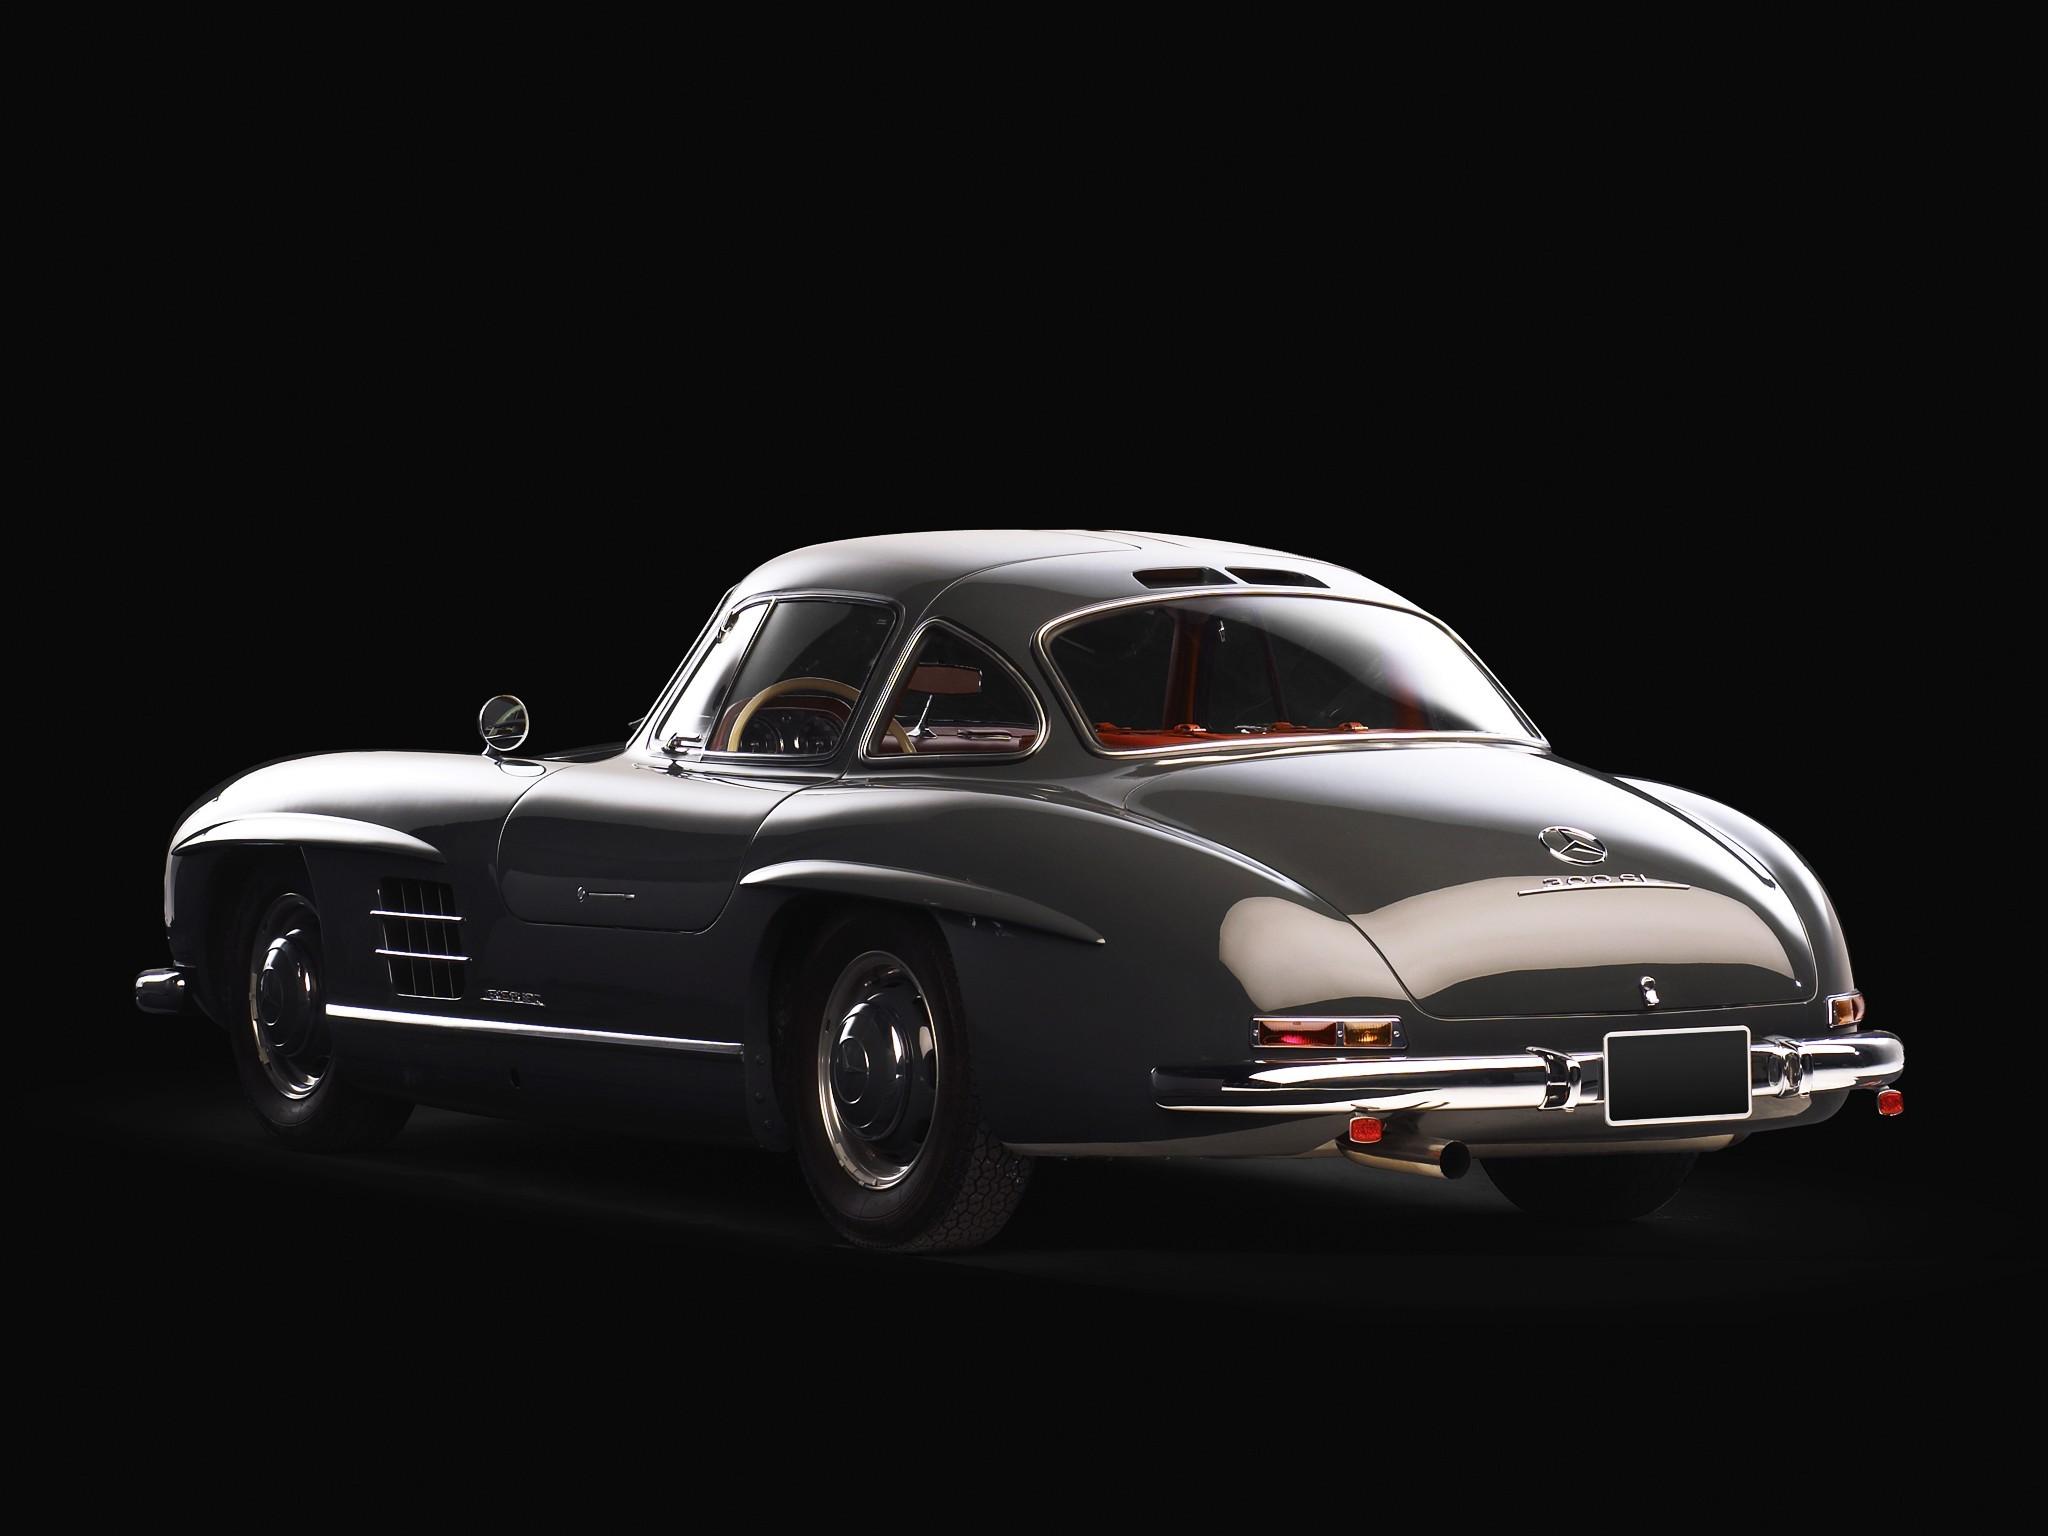 mercedes benz 300 sl coupe w198 1954 1955 1956 1957. Black Bedroom Furniture Sets. Home Design Ideas